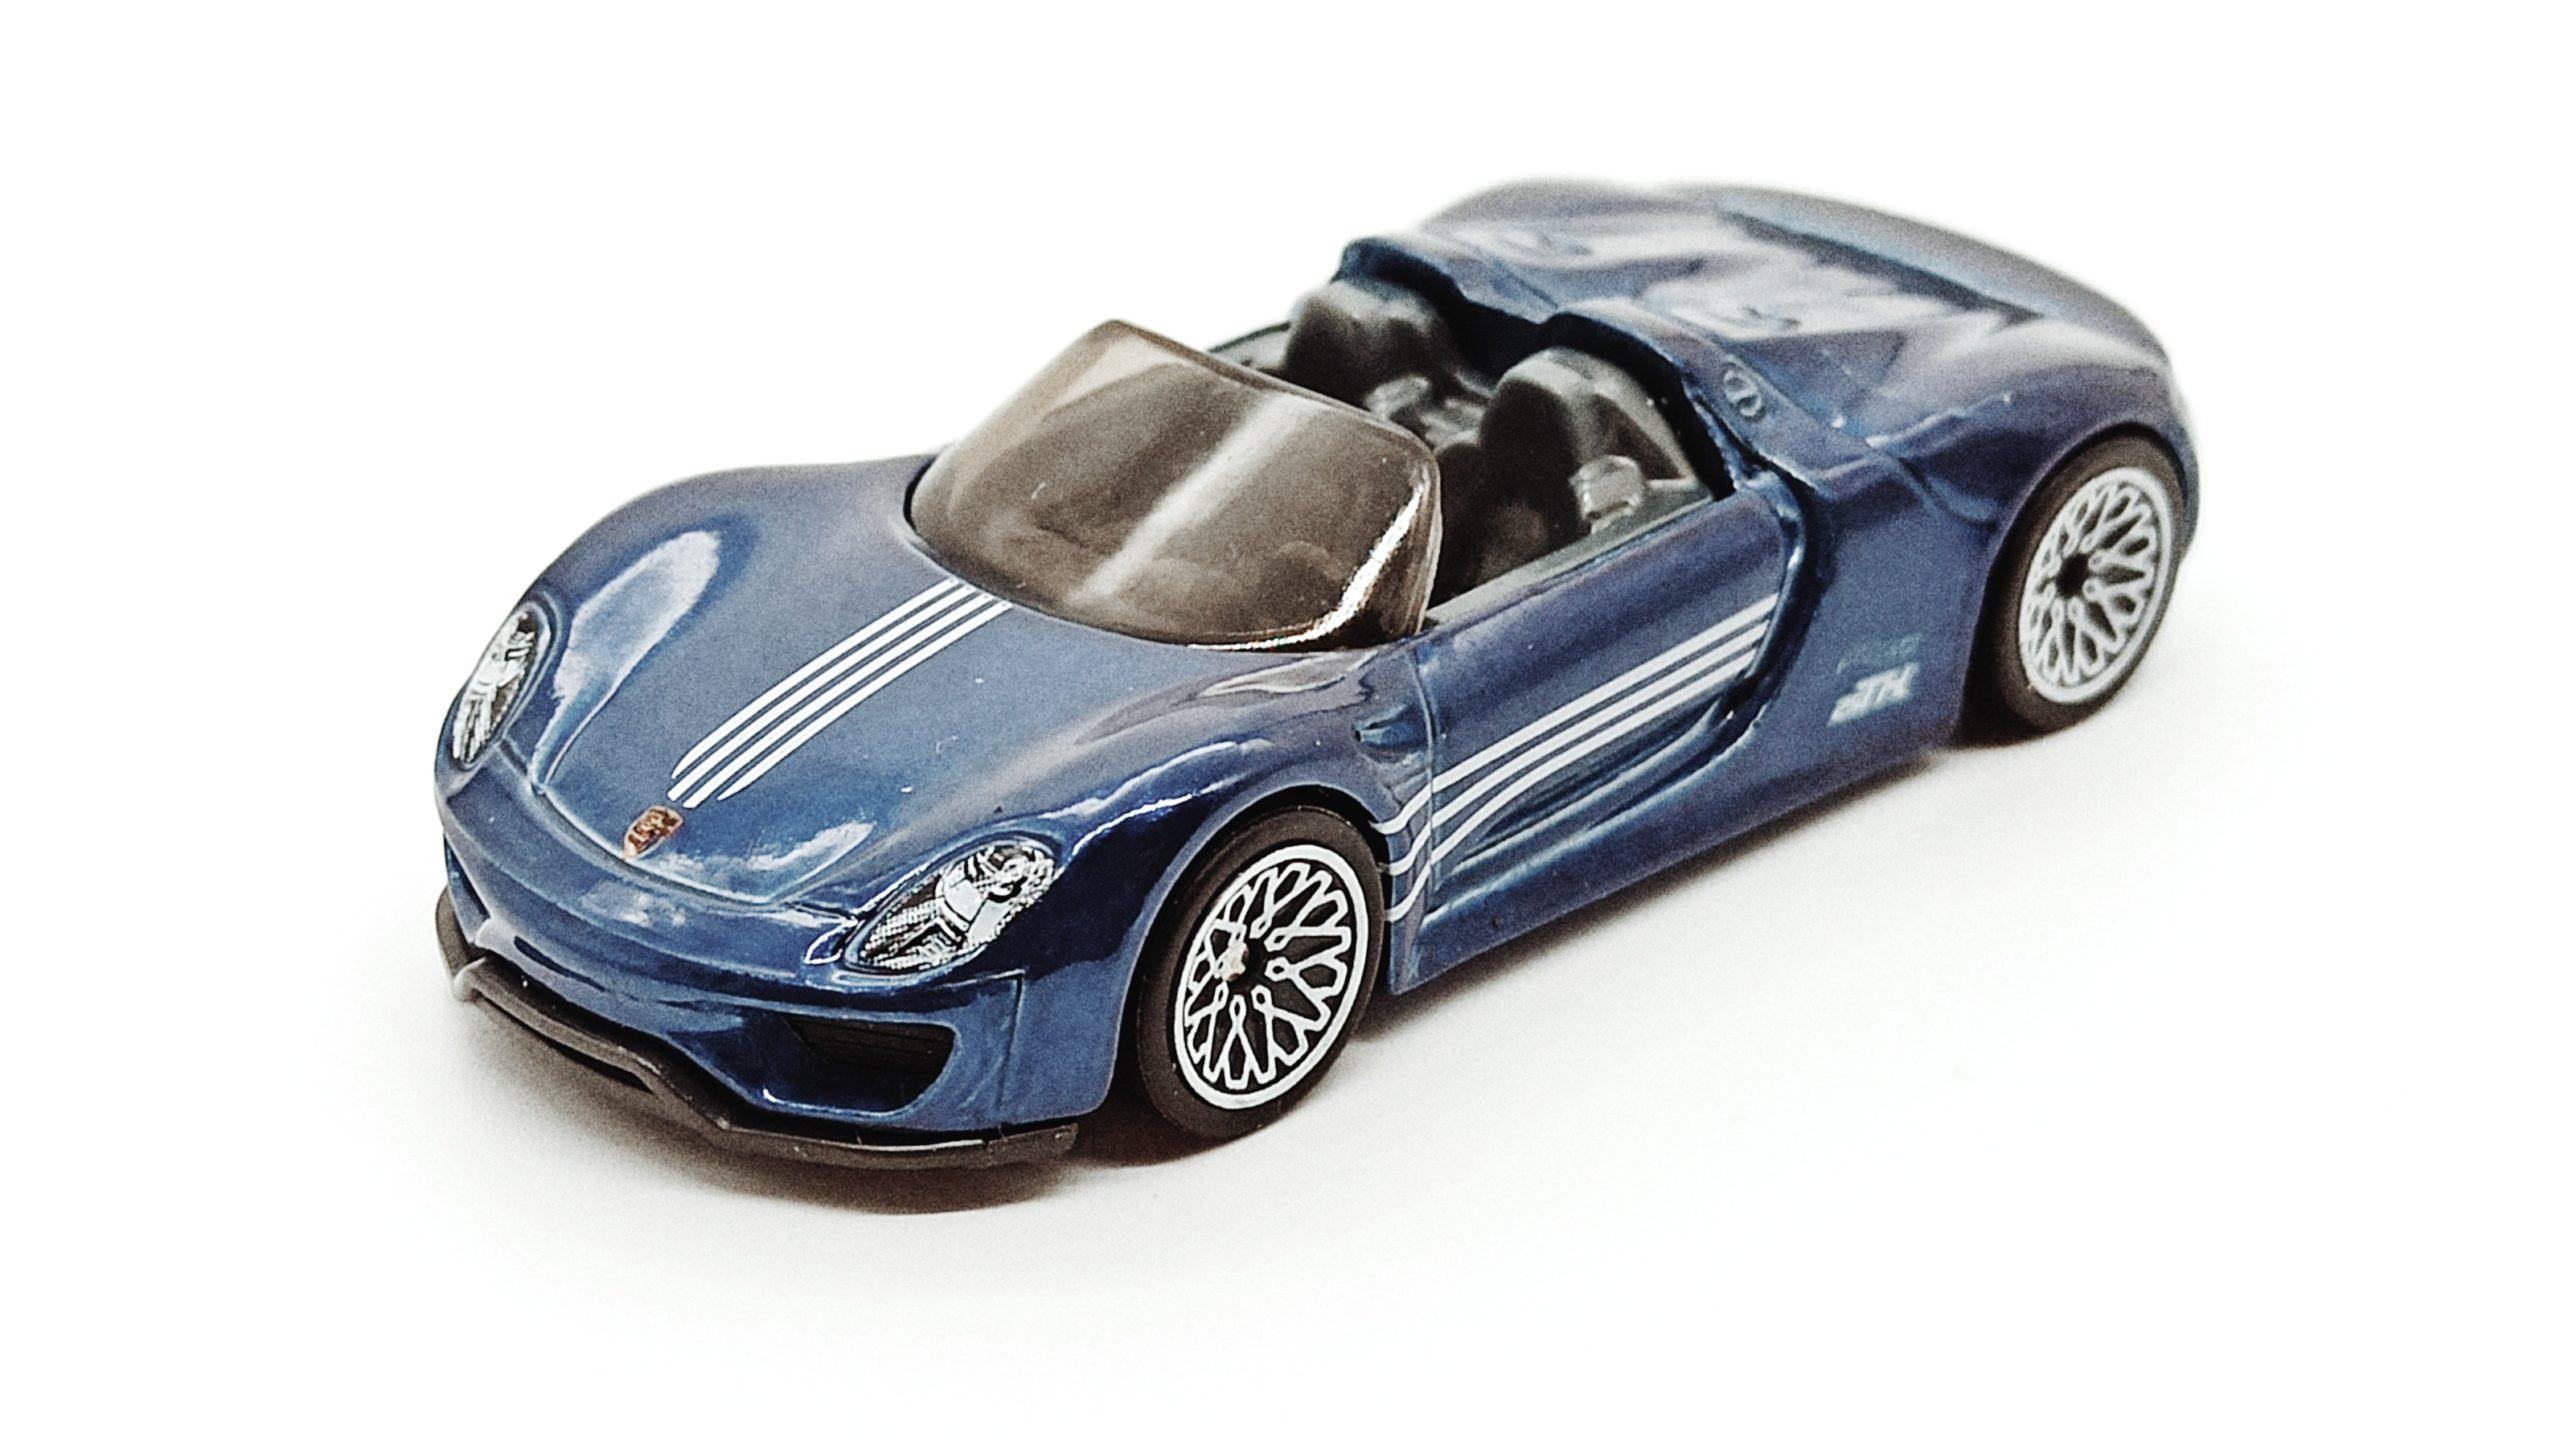 Hot Wheels Porsche 918 Spyder (2018 model) (GHG26) 2020 (94/250) Porsche (5/5) spectraflame blue Super Treasure Hunt (STH) top angle